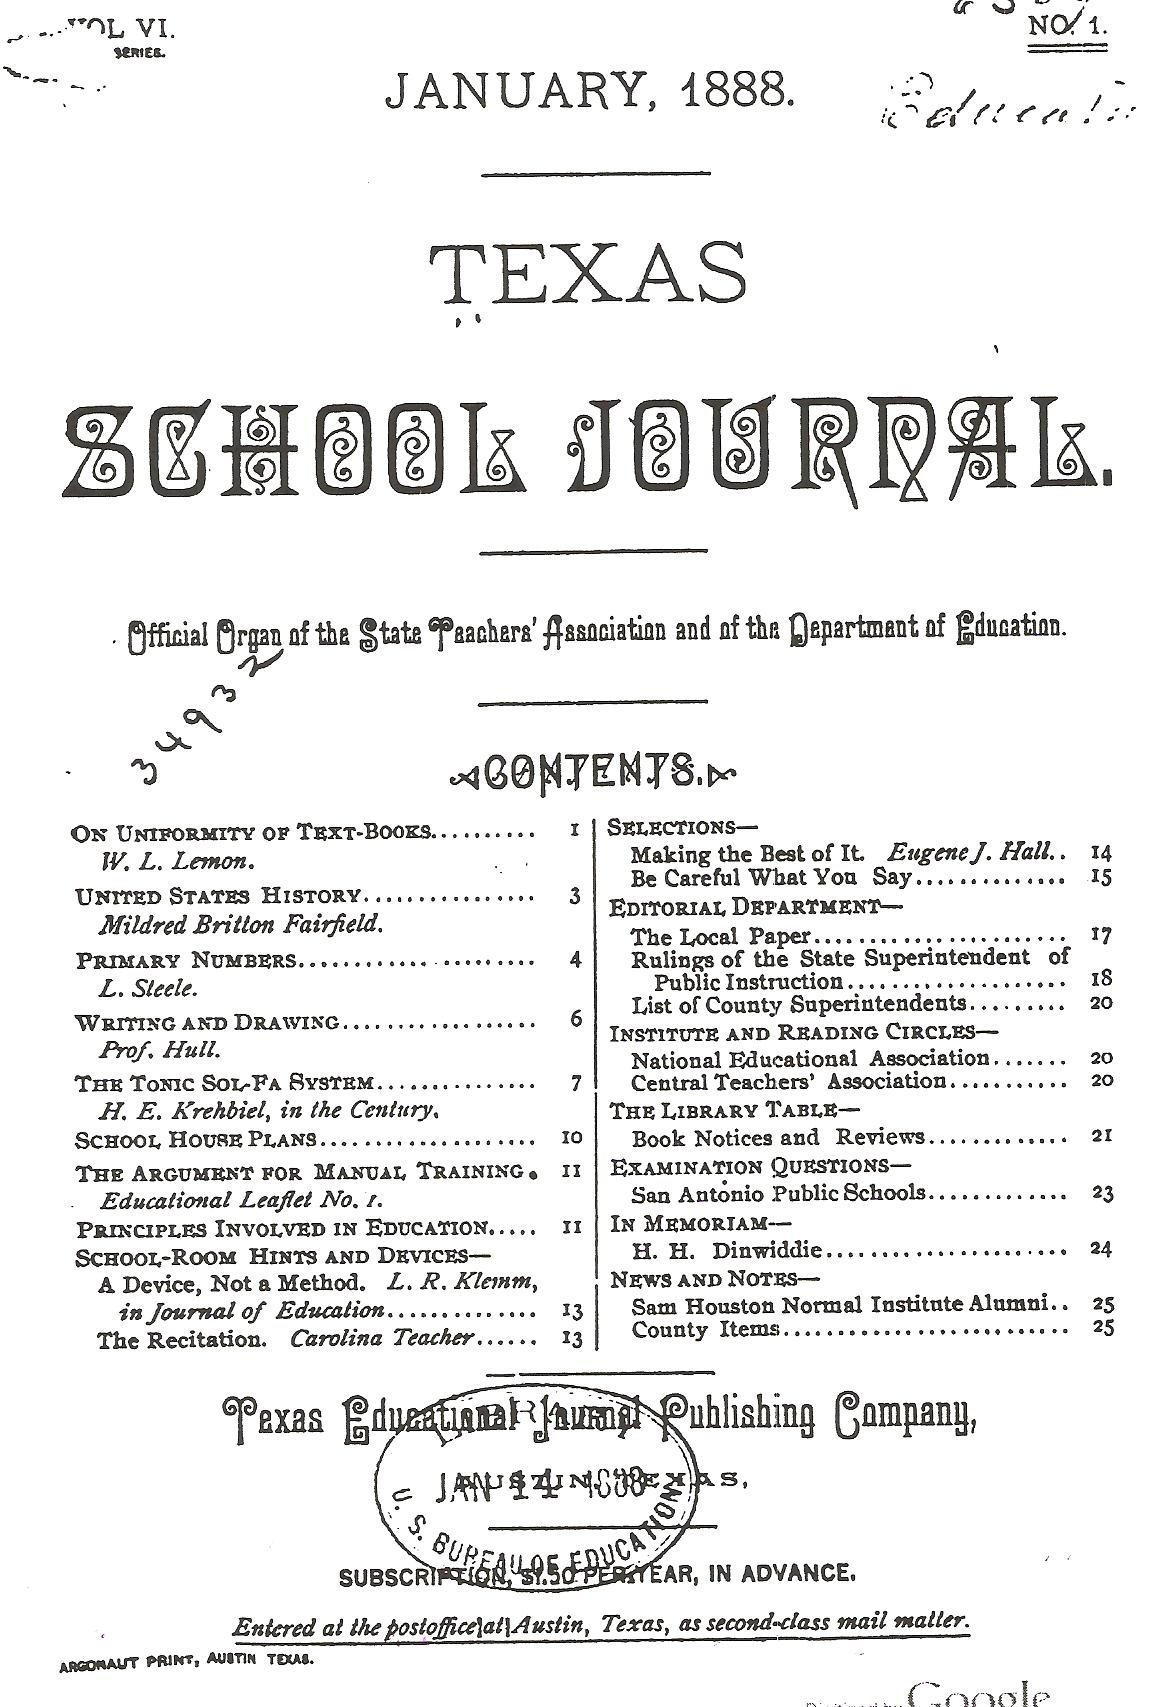 Color printing austin - 1888 Jan Texas School Journal Vol Vi No 1 Jtm Lindsay Principal 2nd Ward Colored School Denison Tx